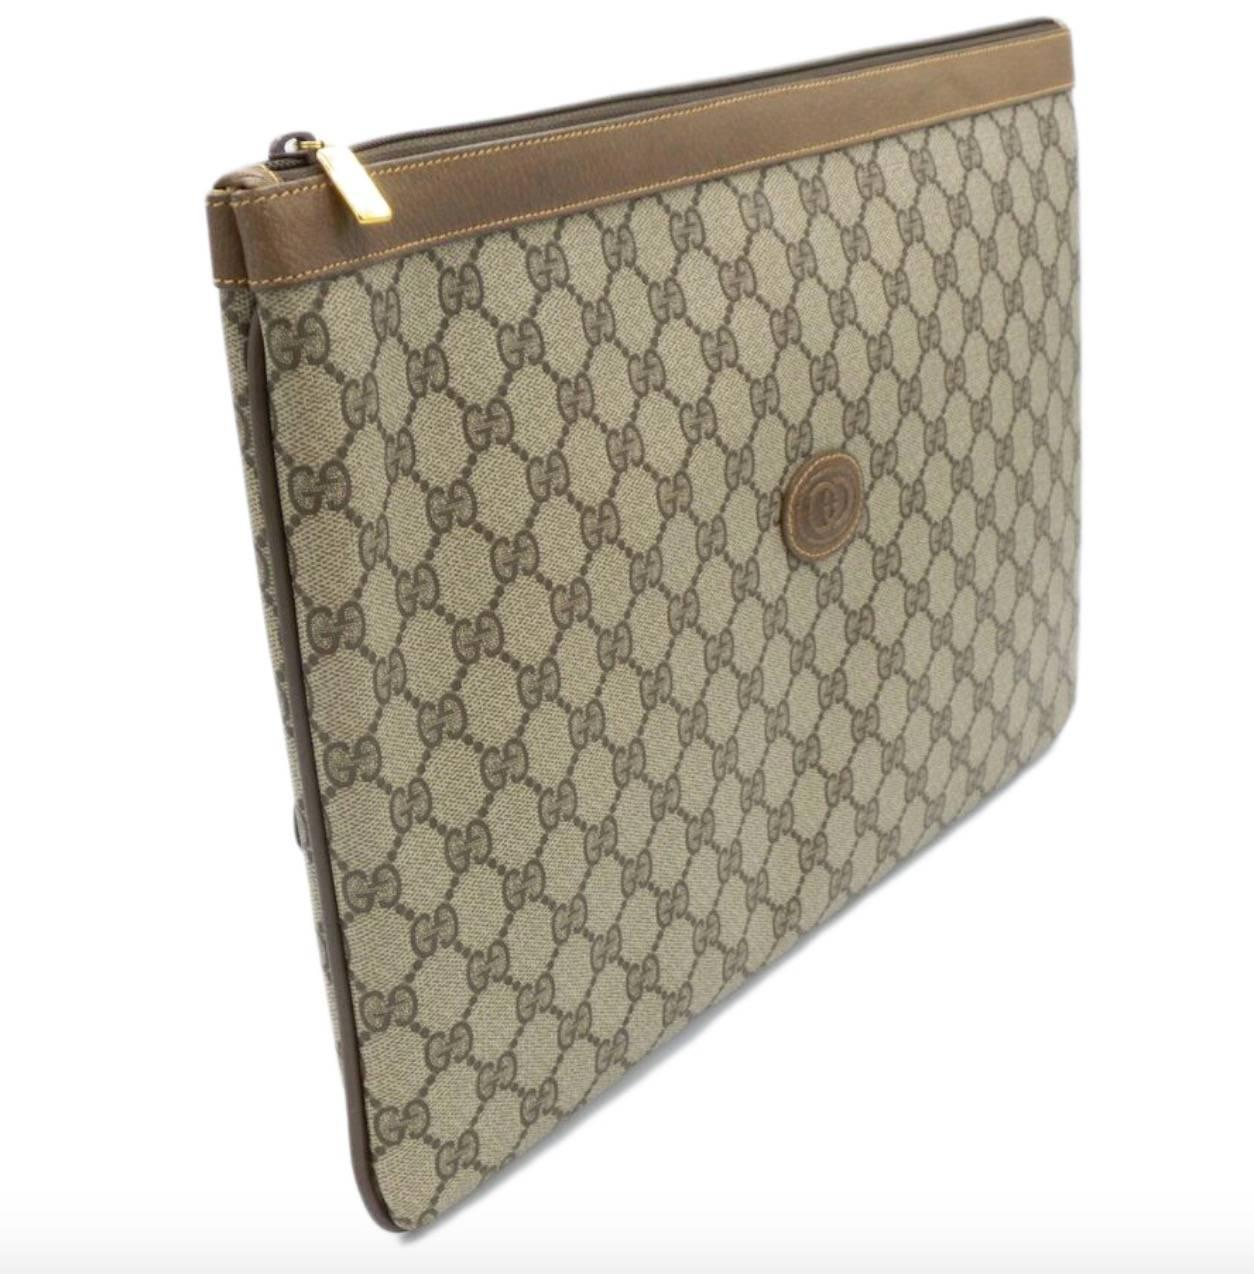 Gucci Monogram Gg Mens Portfolio Travel Ipad Laptop Travel Envelope Clutch Bag aiOJ2gT